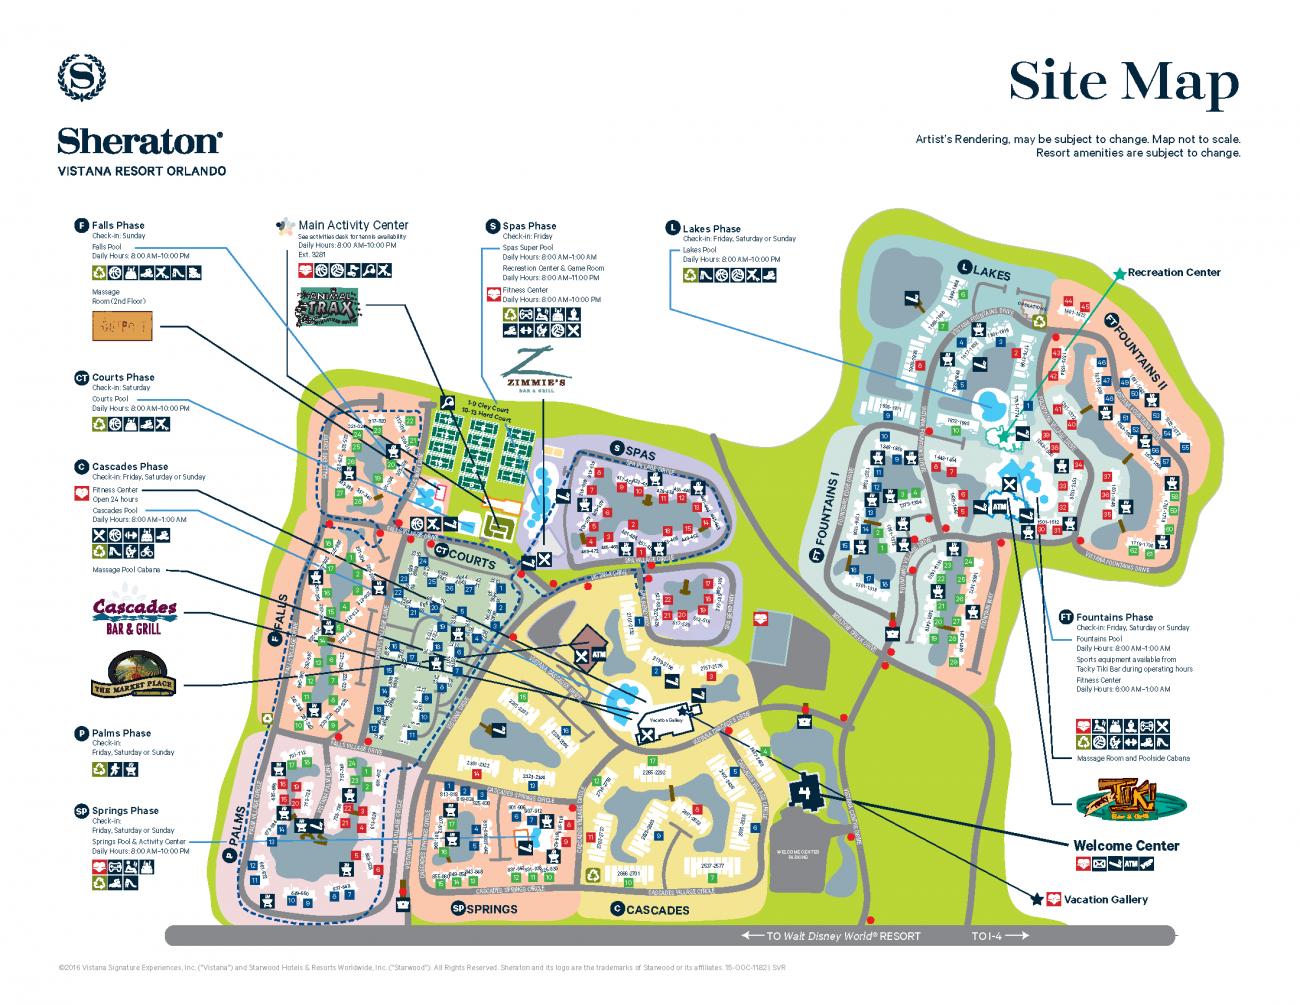 Sheraton Vistana Resort Maps